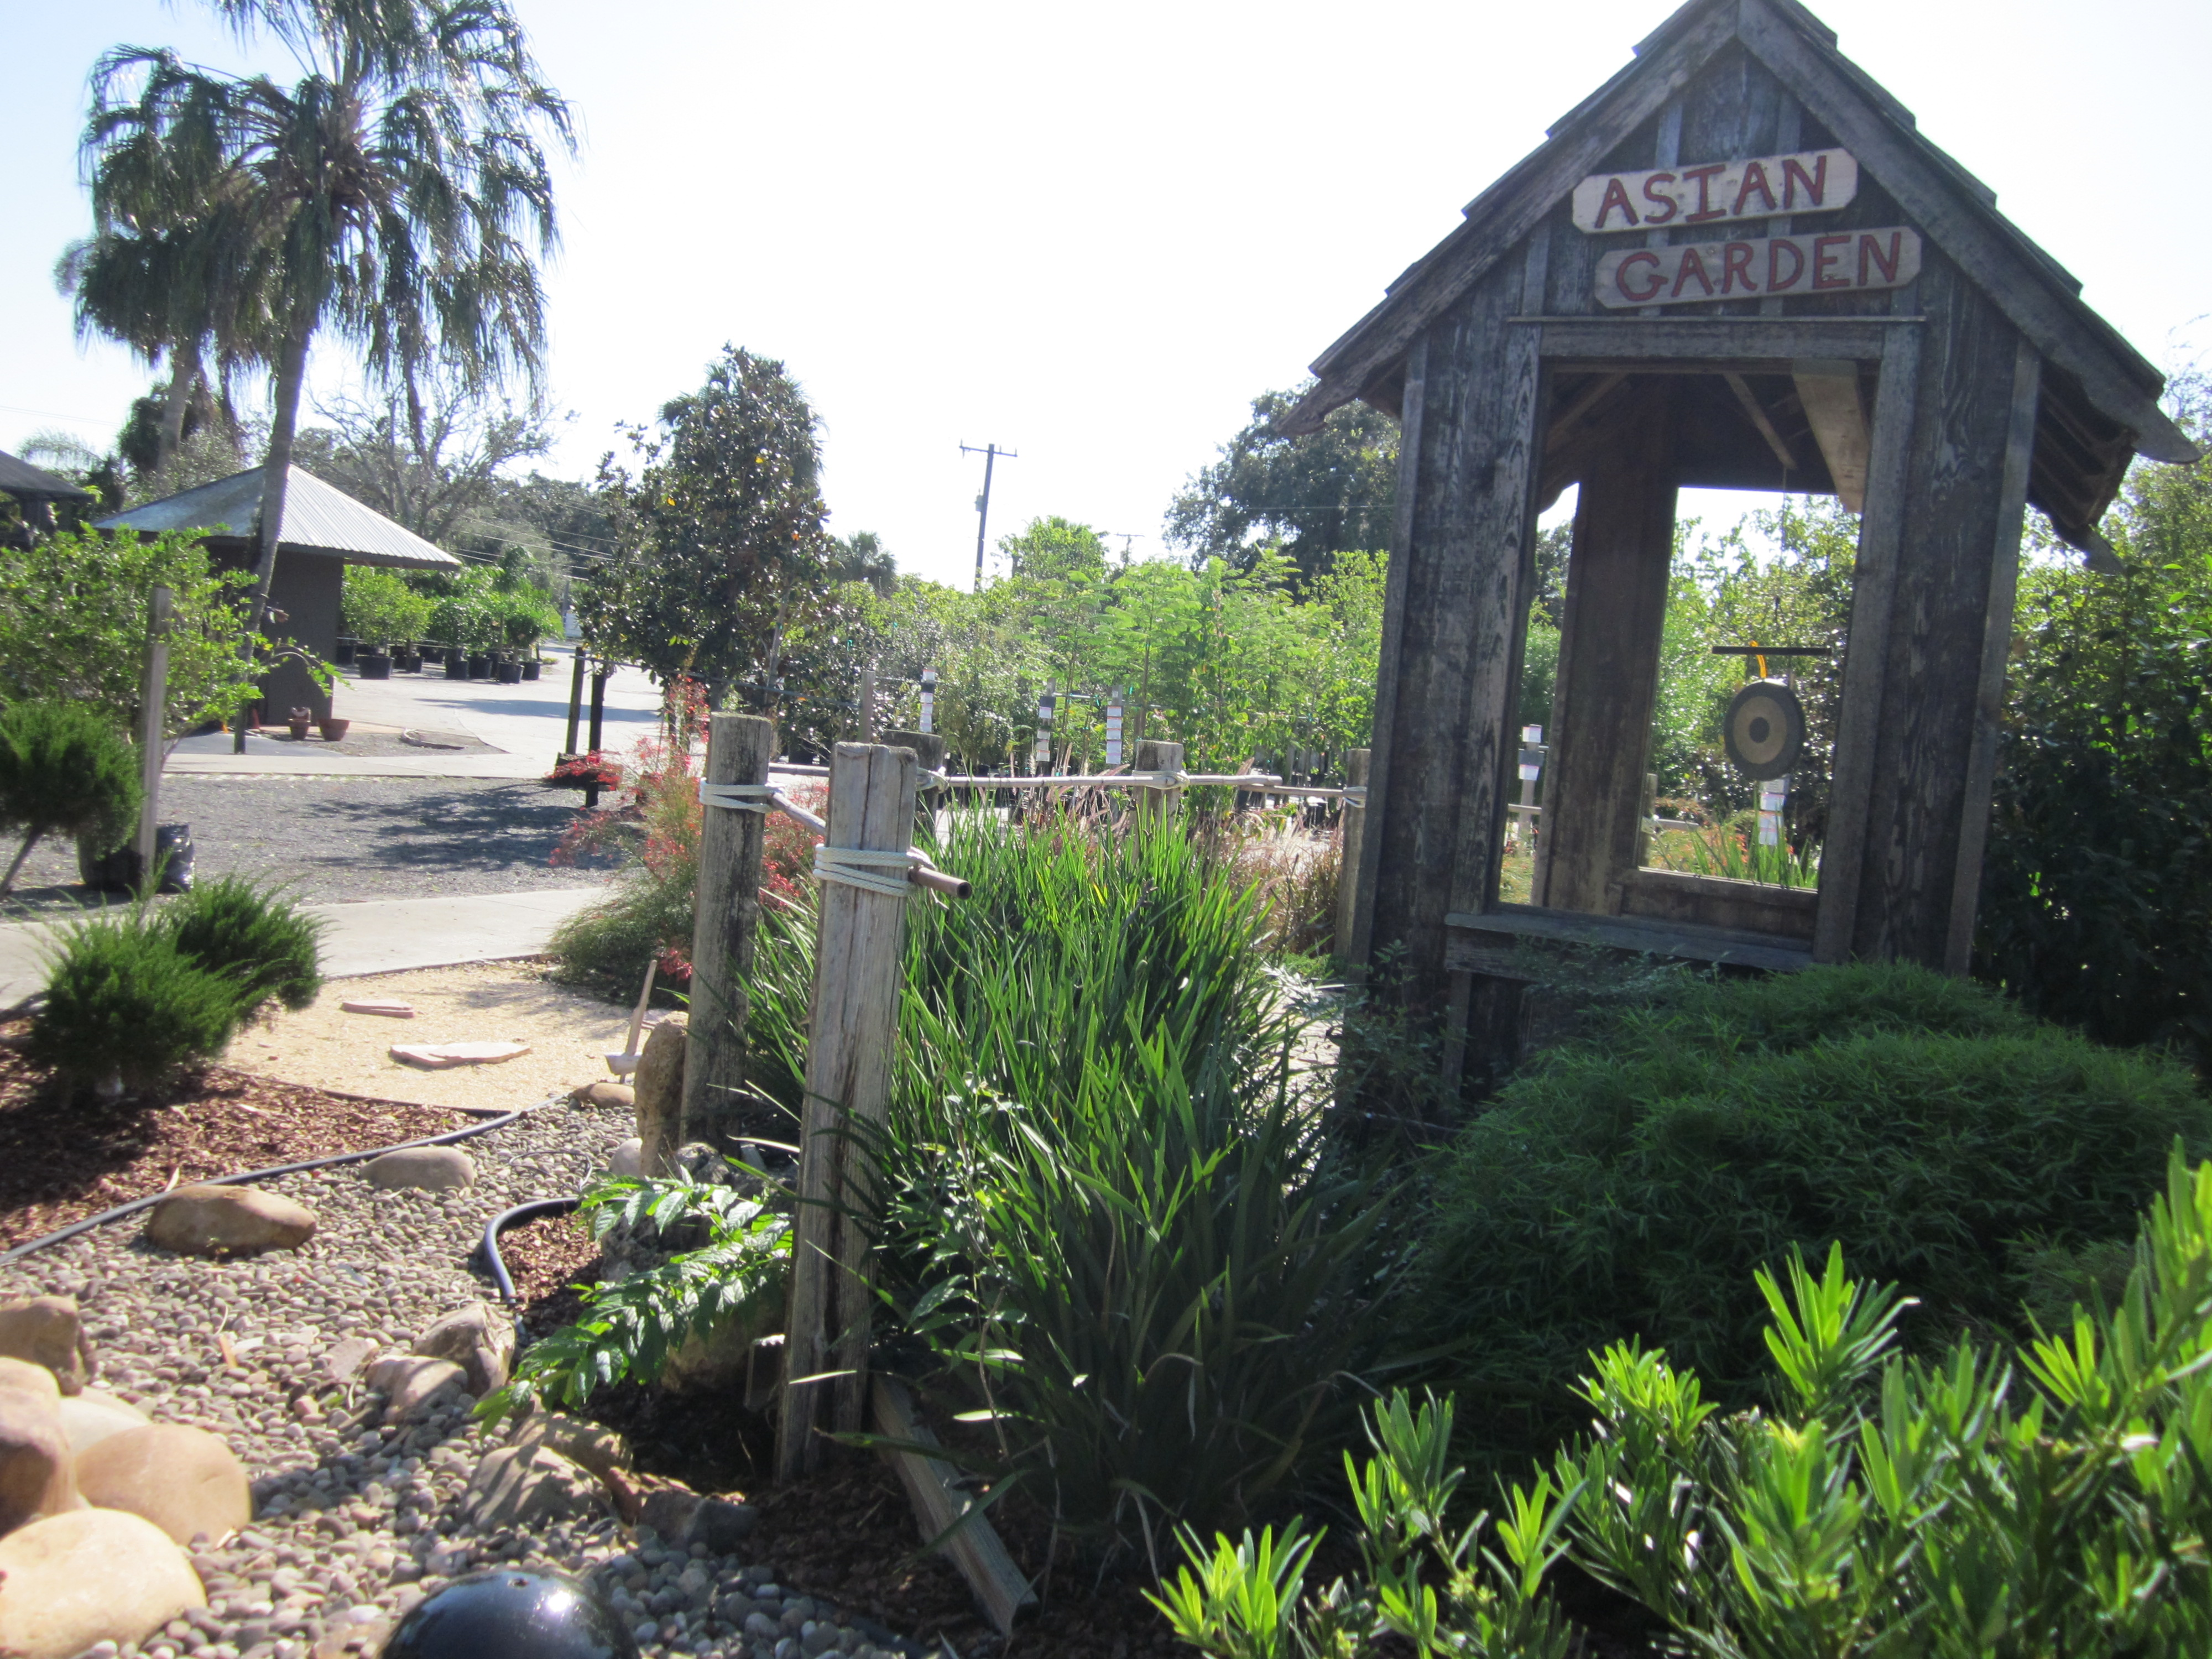 file asian garden at rockledge gardens wikimedia mons